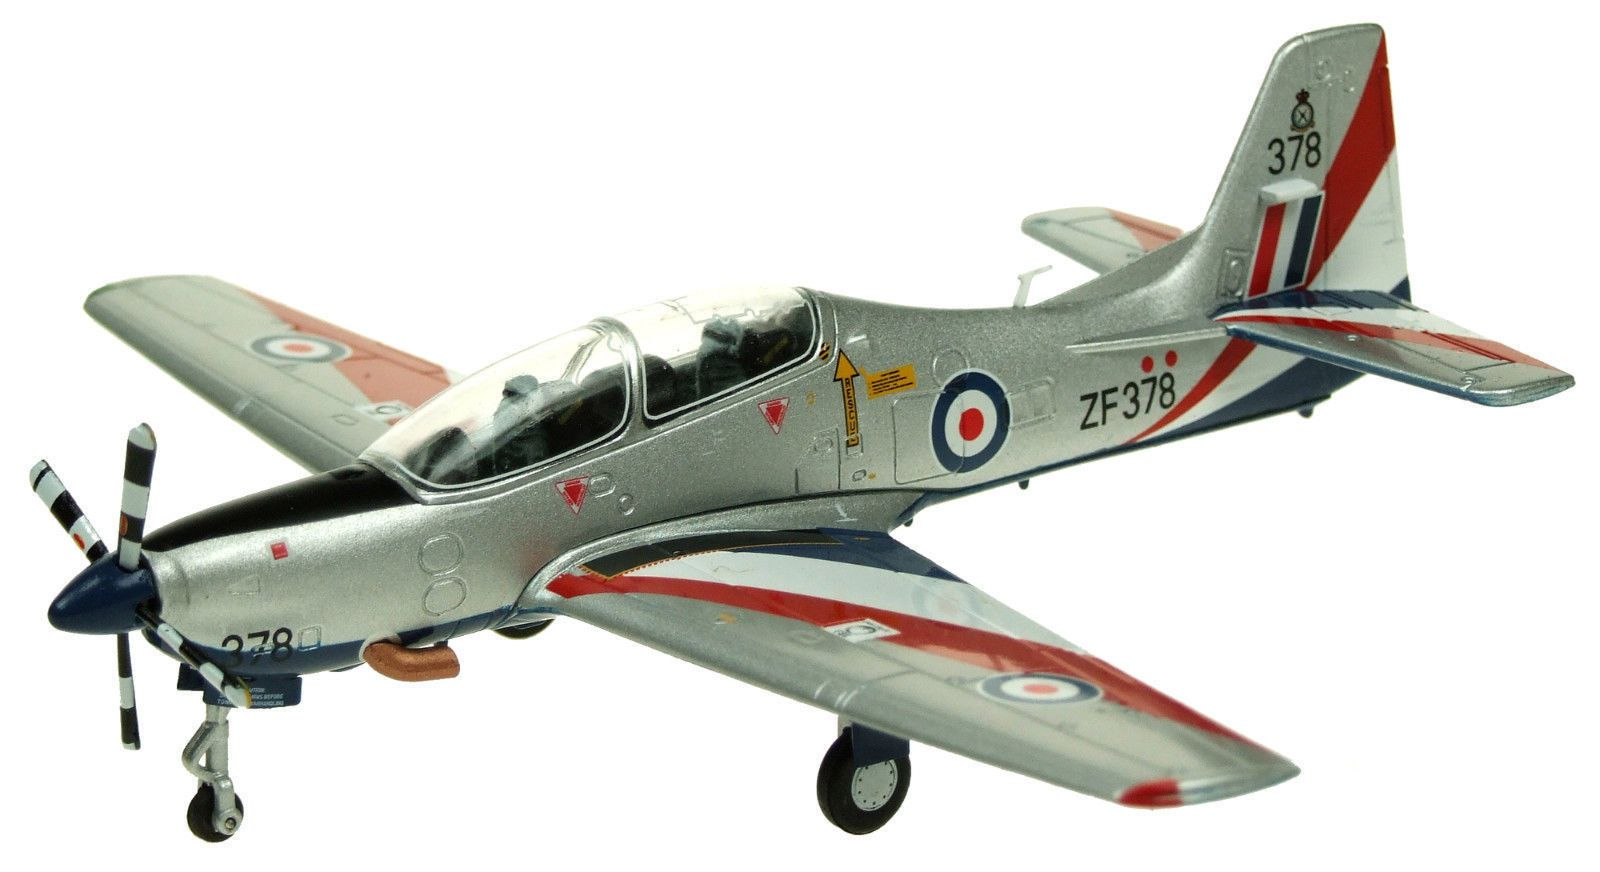 Picture Gallery for Aviation 72 AV7227005 Short Tucano T1 FTS ZF378